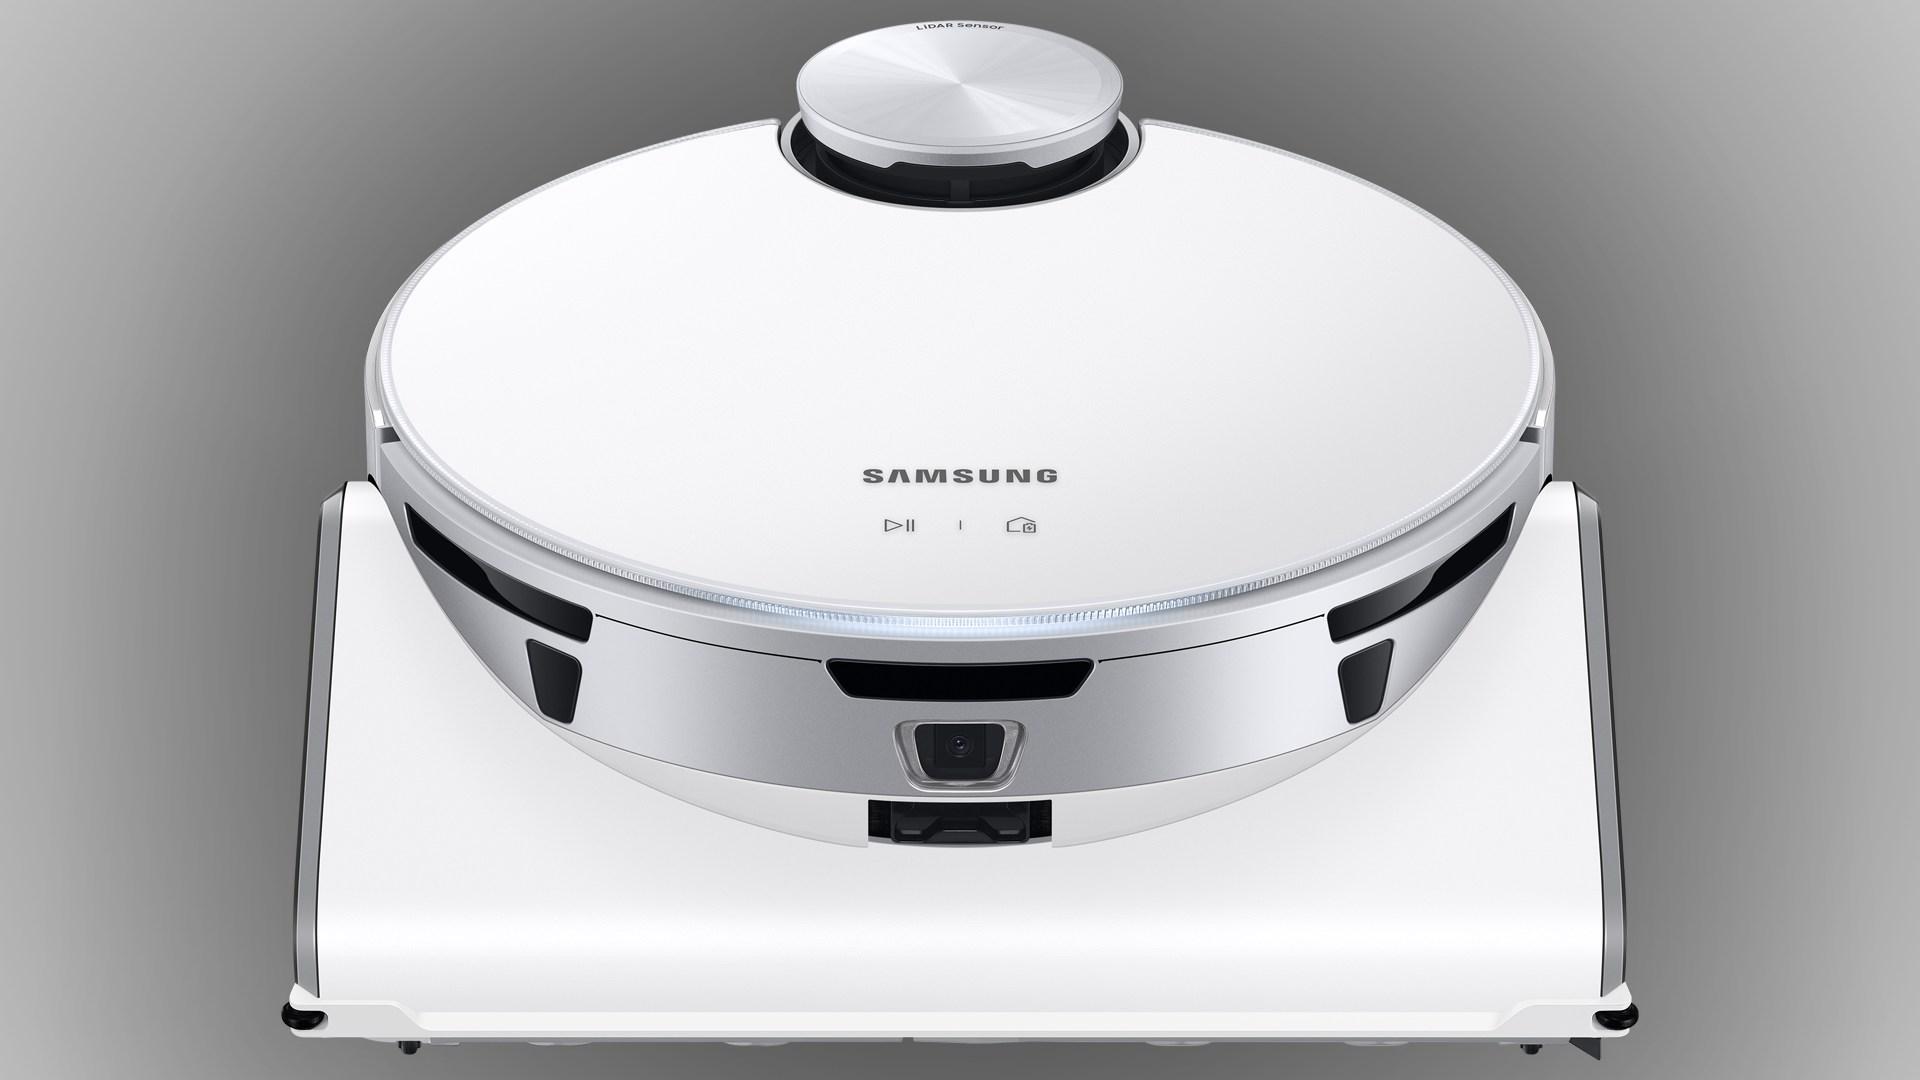 Samsung, Staubsauger, Saugroboter, Staubsaugerroboter, JetBot, Jet Bot, Samsung Jet Bot 95 AI+